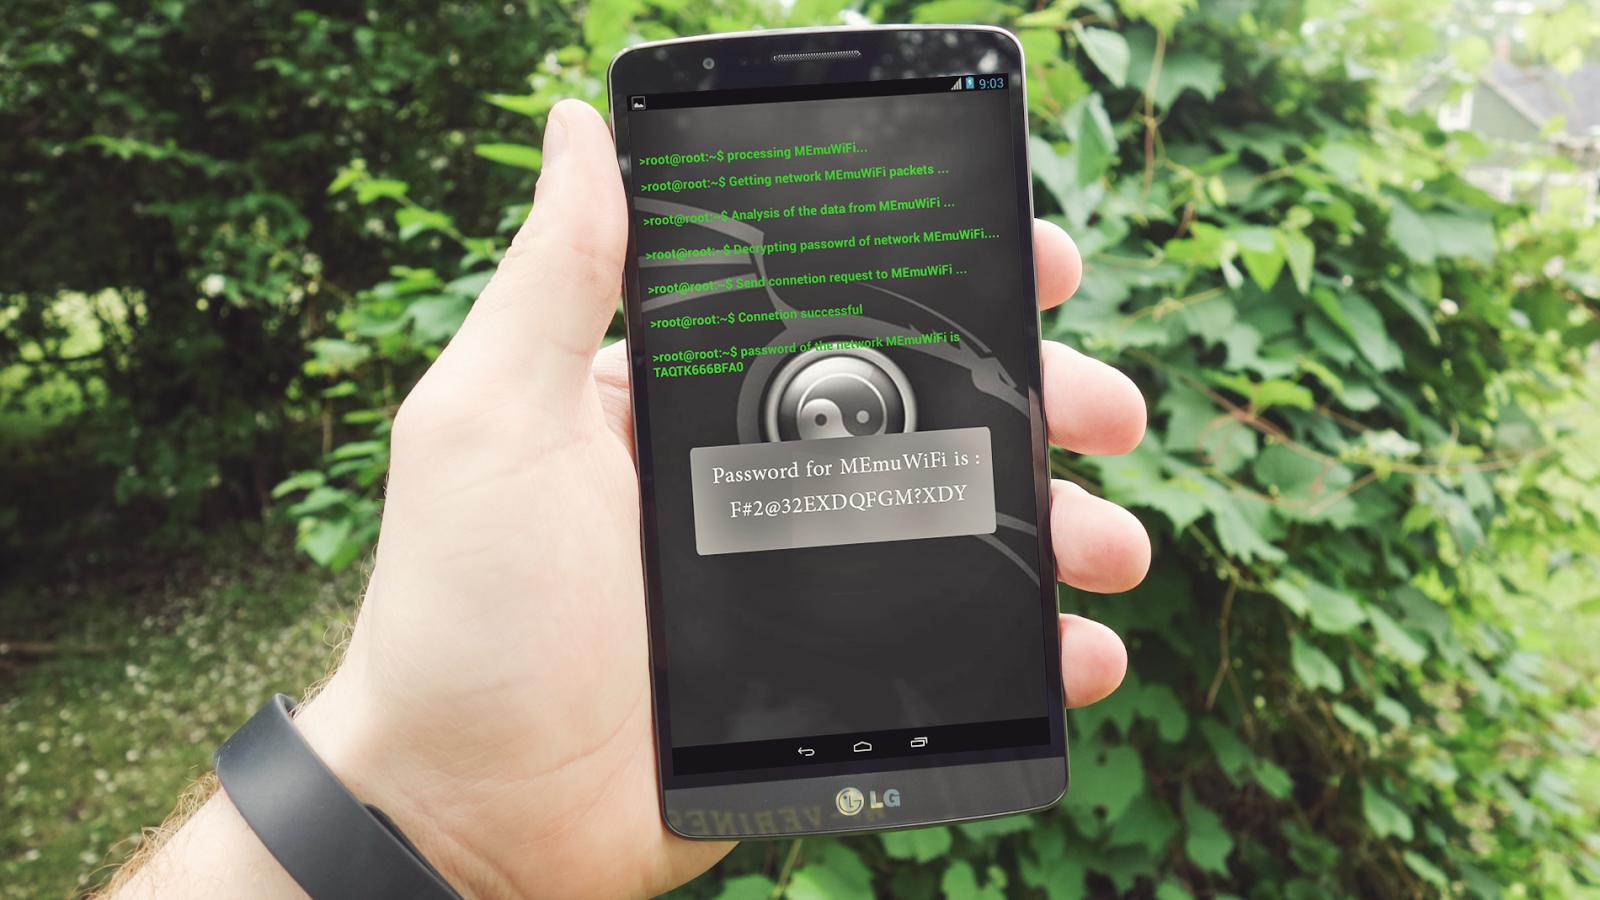 wifi wps pin wpa2 hack prank 5 0 6 APK Download - Android